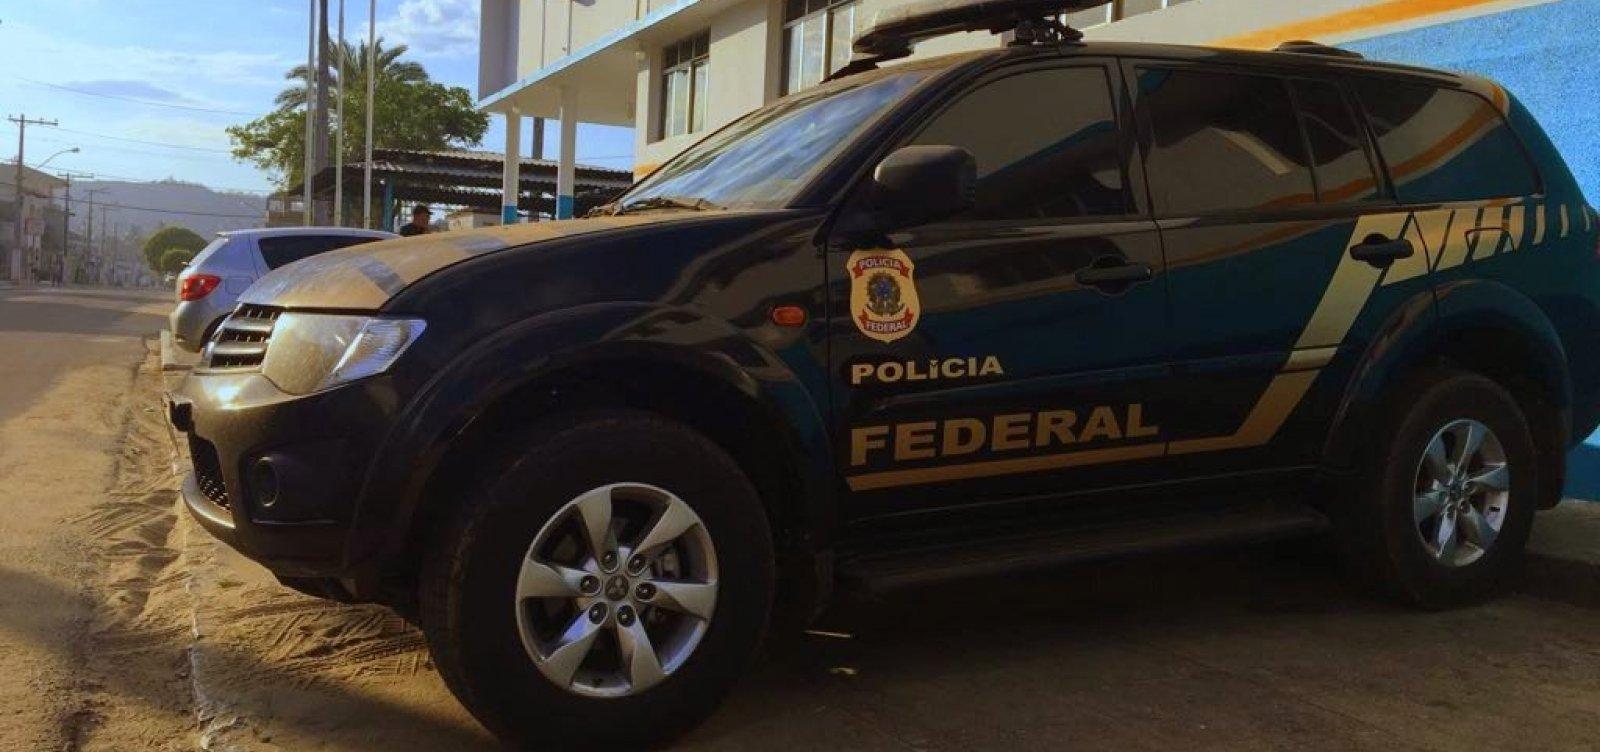 [Polícia Federal prende banqueiro relacionado a esquema de Sérgio Cabral]